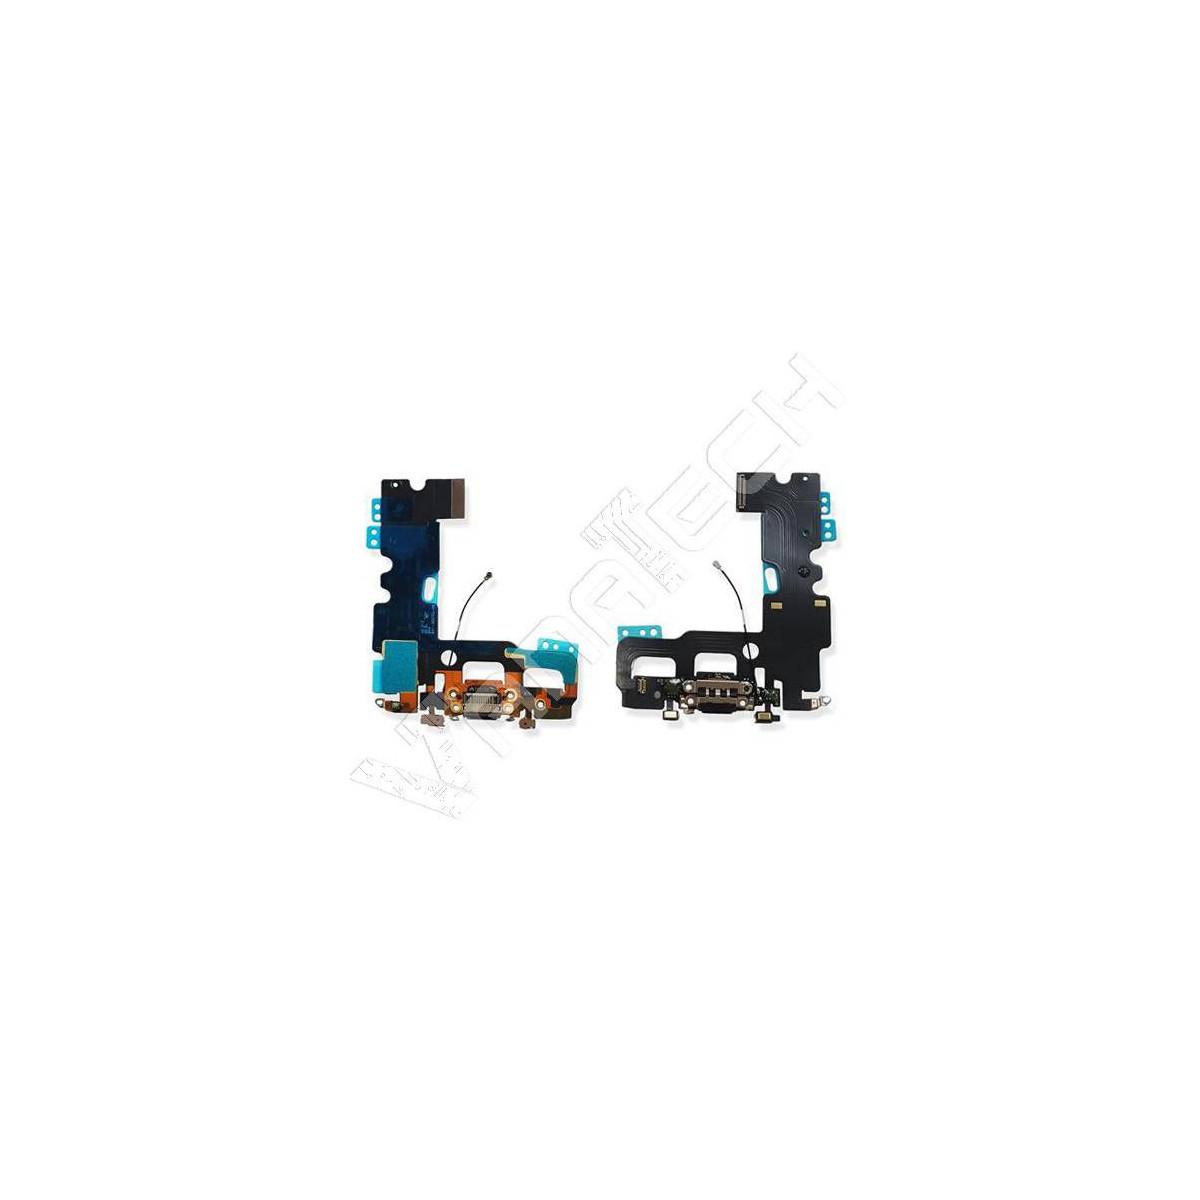 CAVO STAMPANTE USB 3 METRI USB 2.0 AD ALTA VELOCITA'